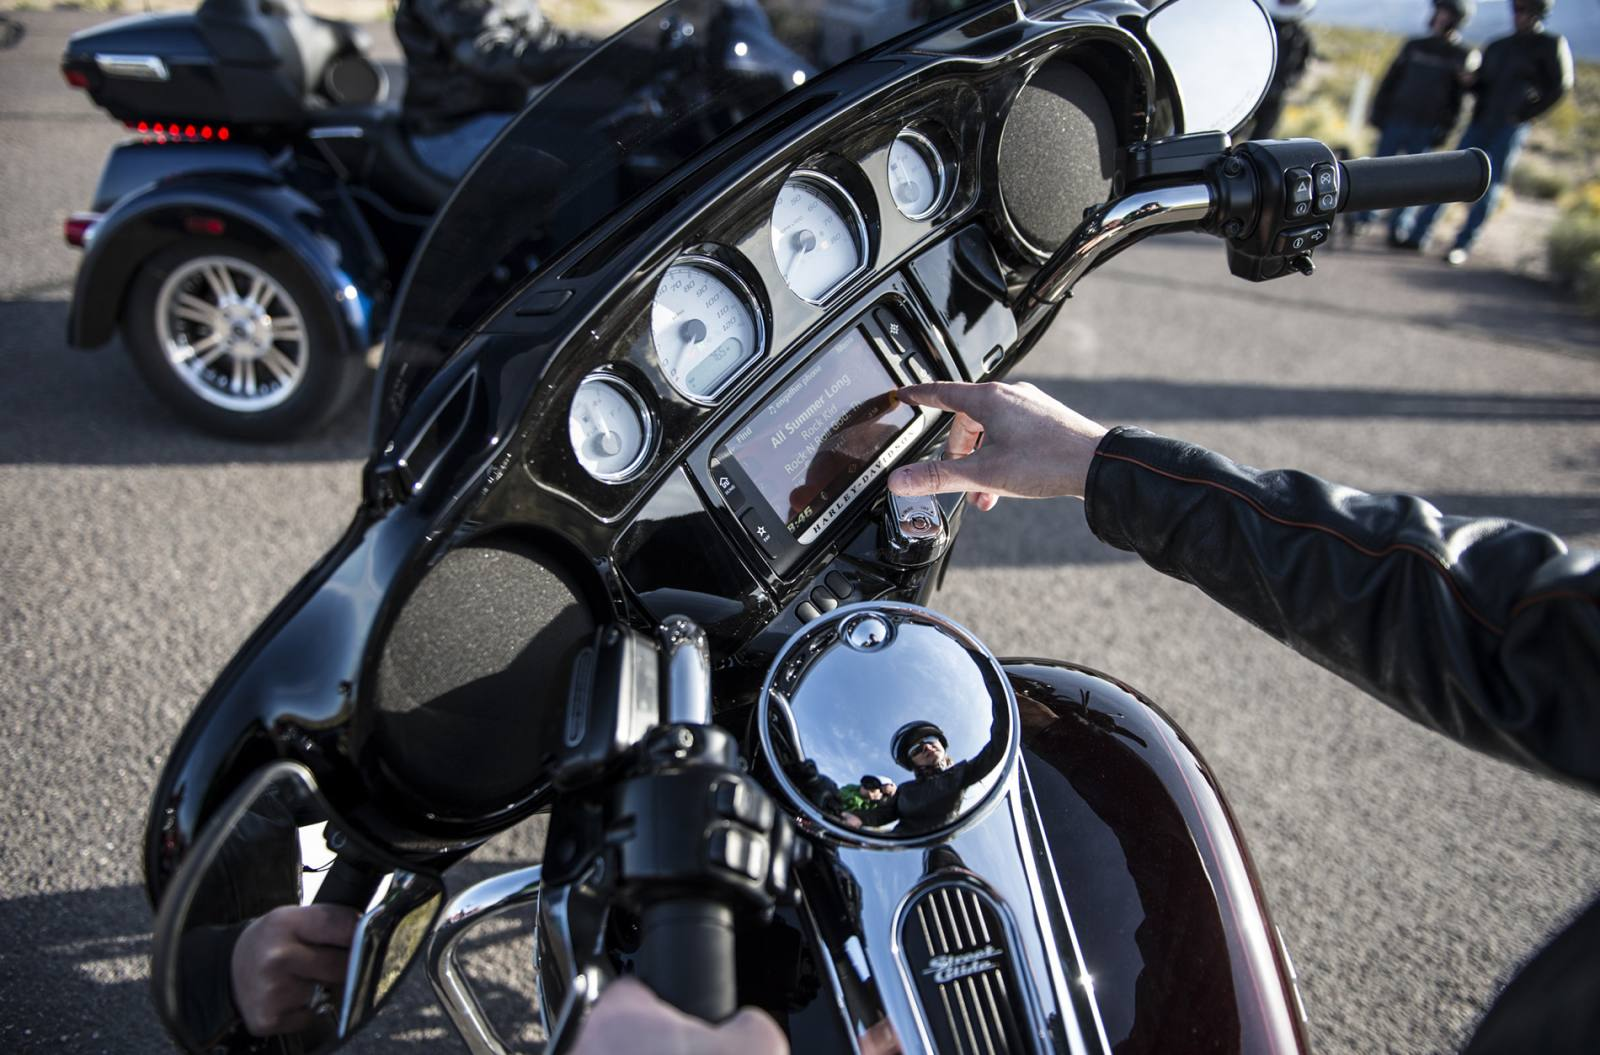 Item 2016 Harley Davidson Flhxs Street Glide Special Locationid 24658